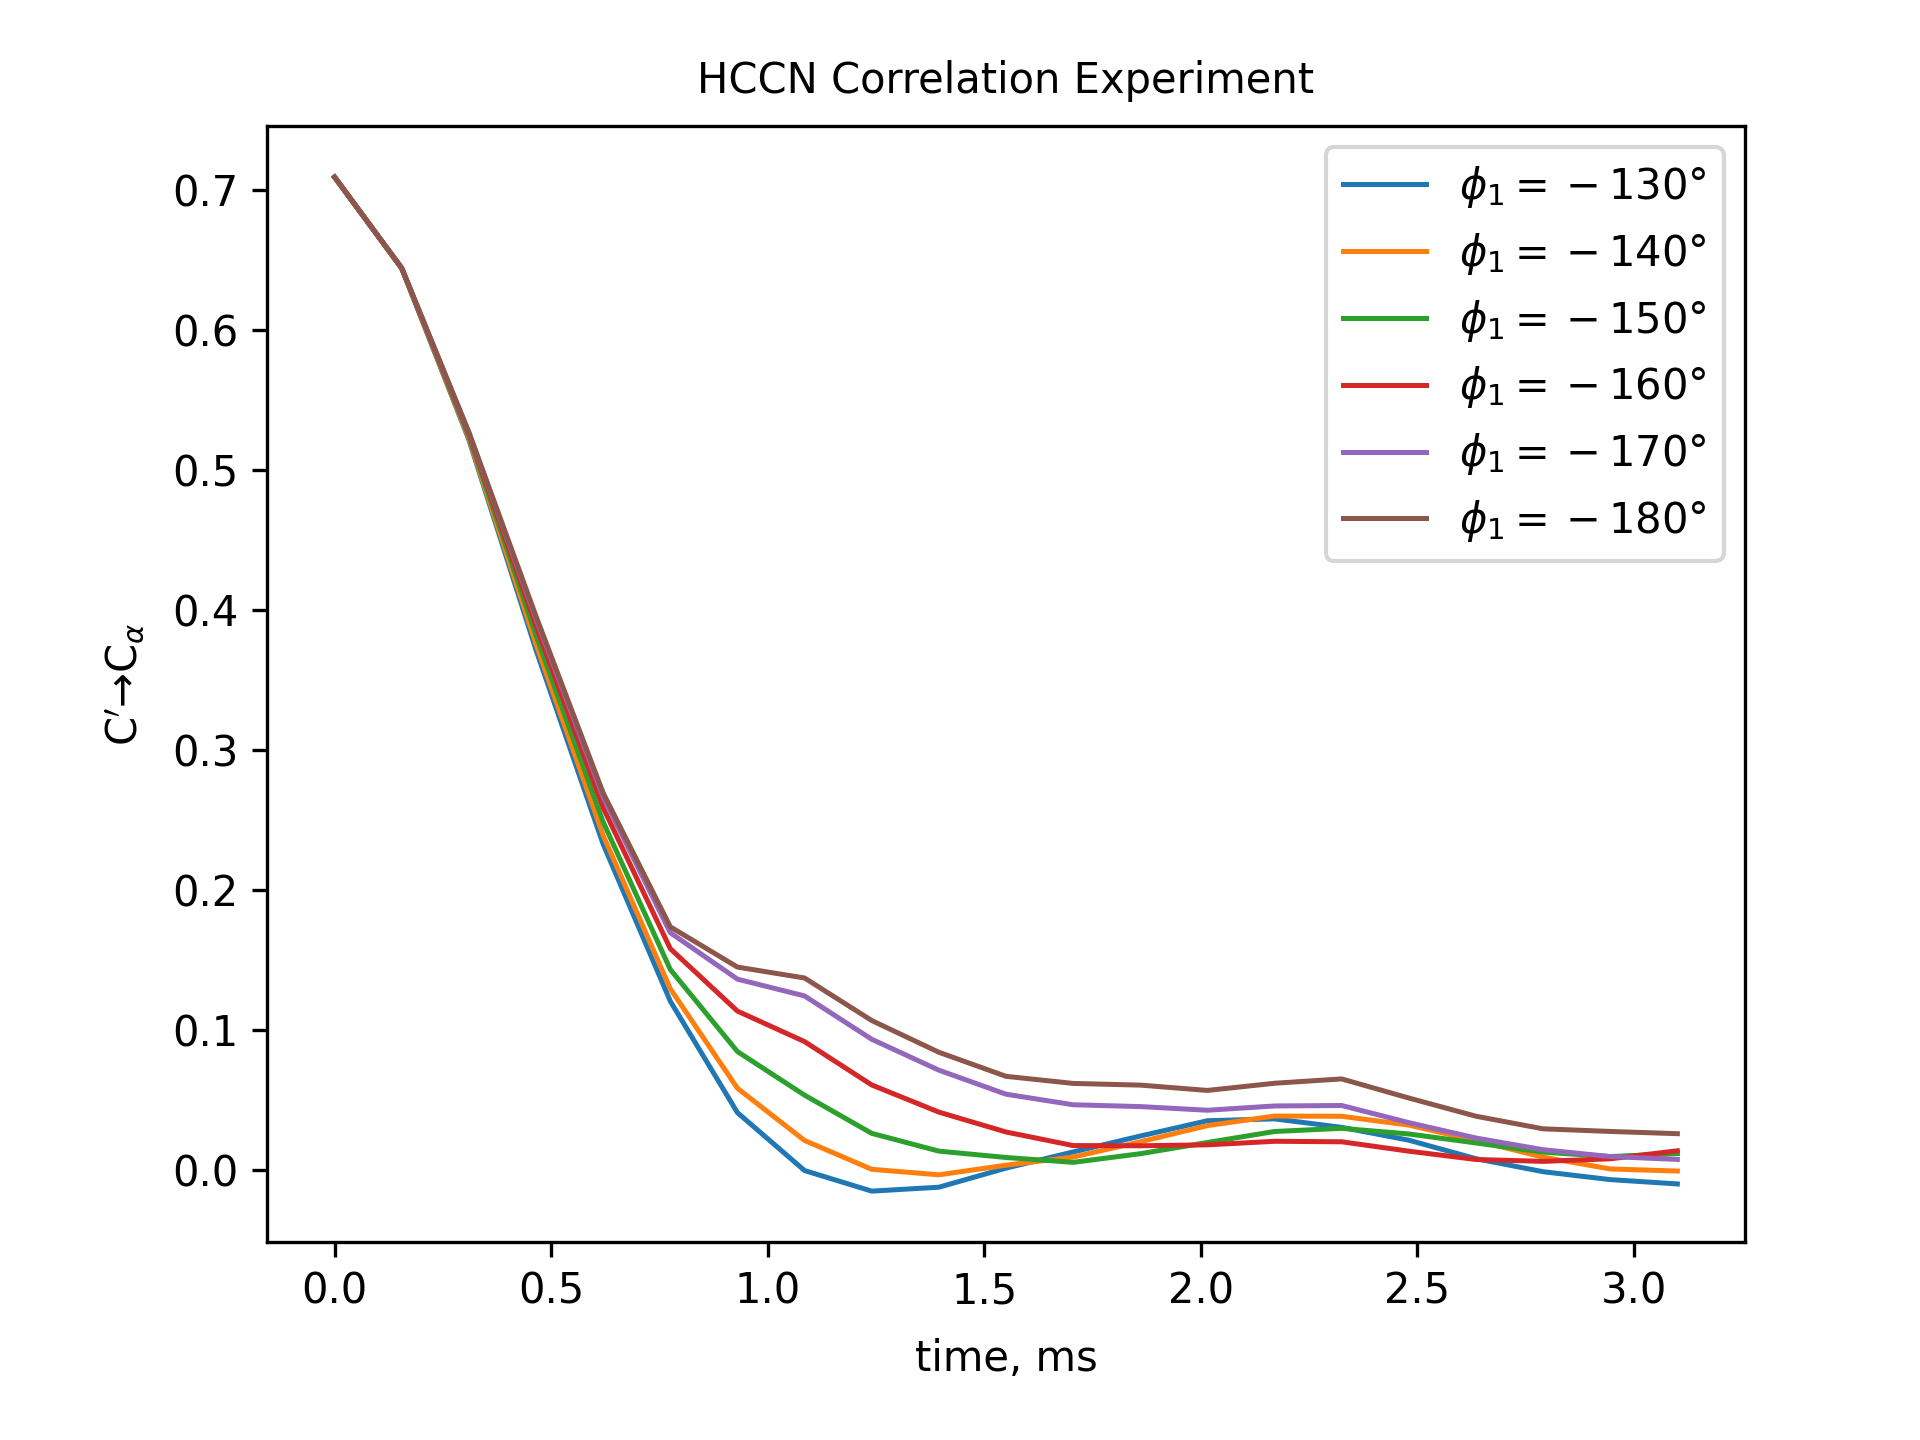 HCCN Correlation Experiment